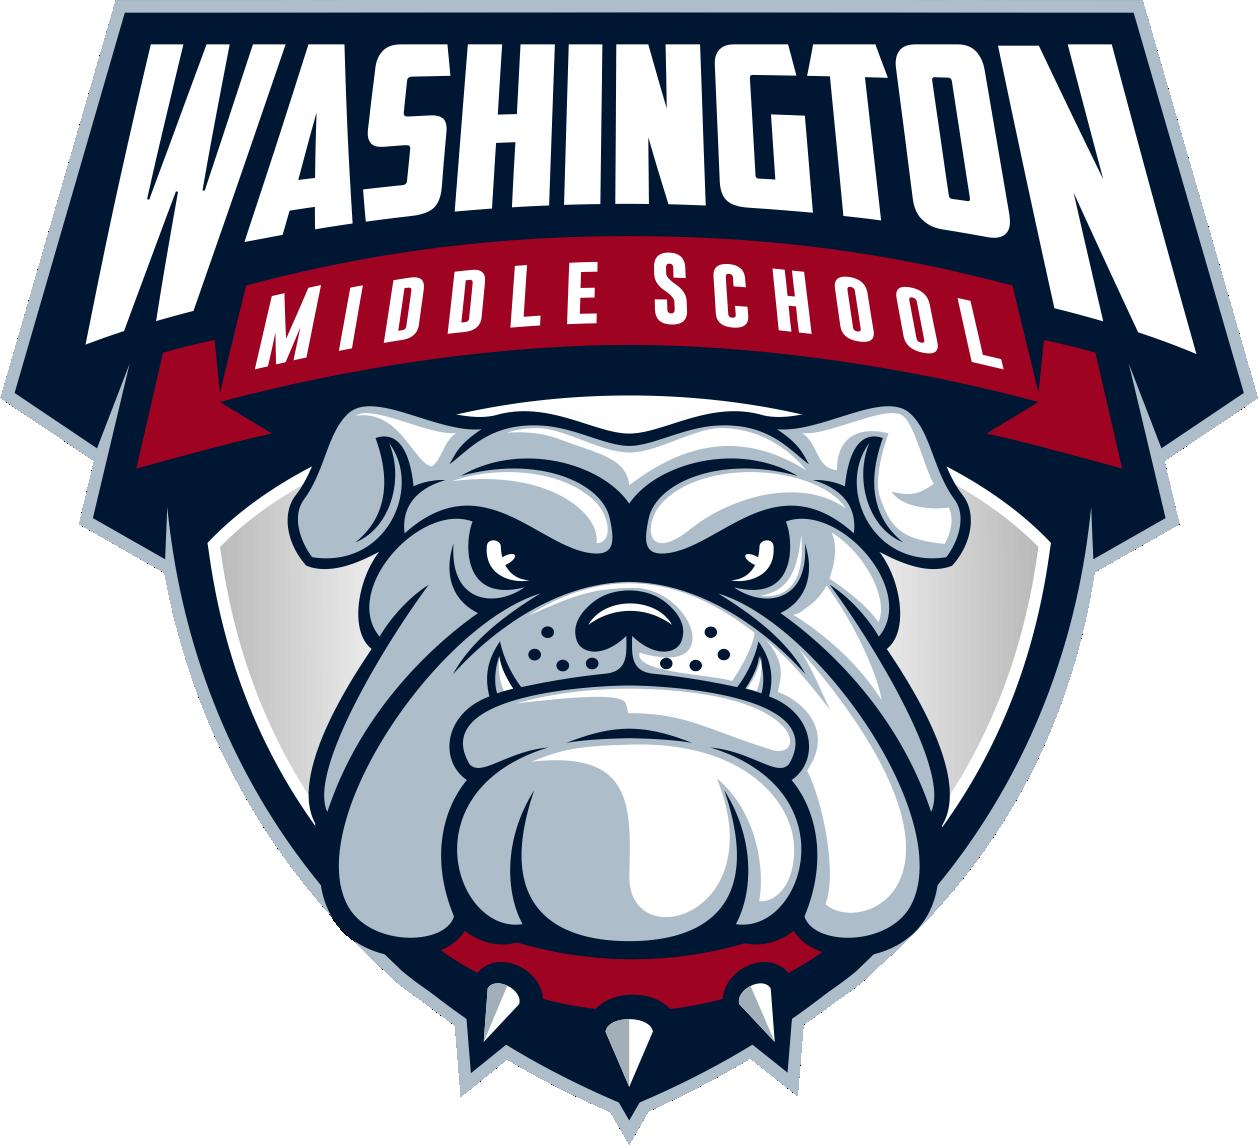 Design a cool bulldog for Washington Middle School!